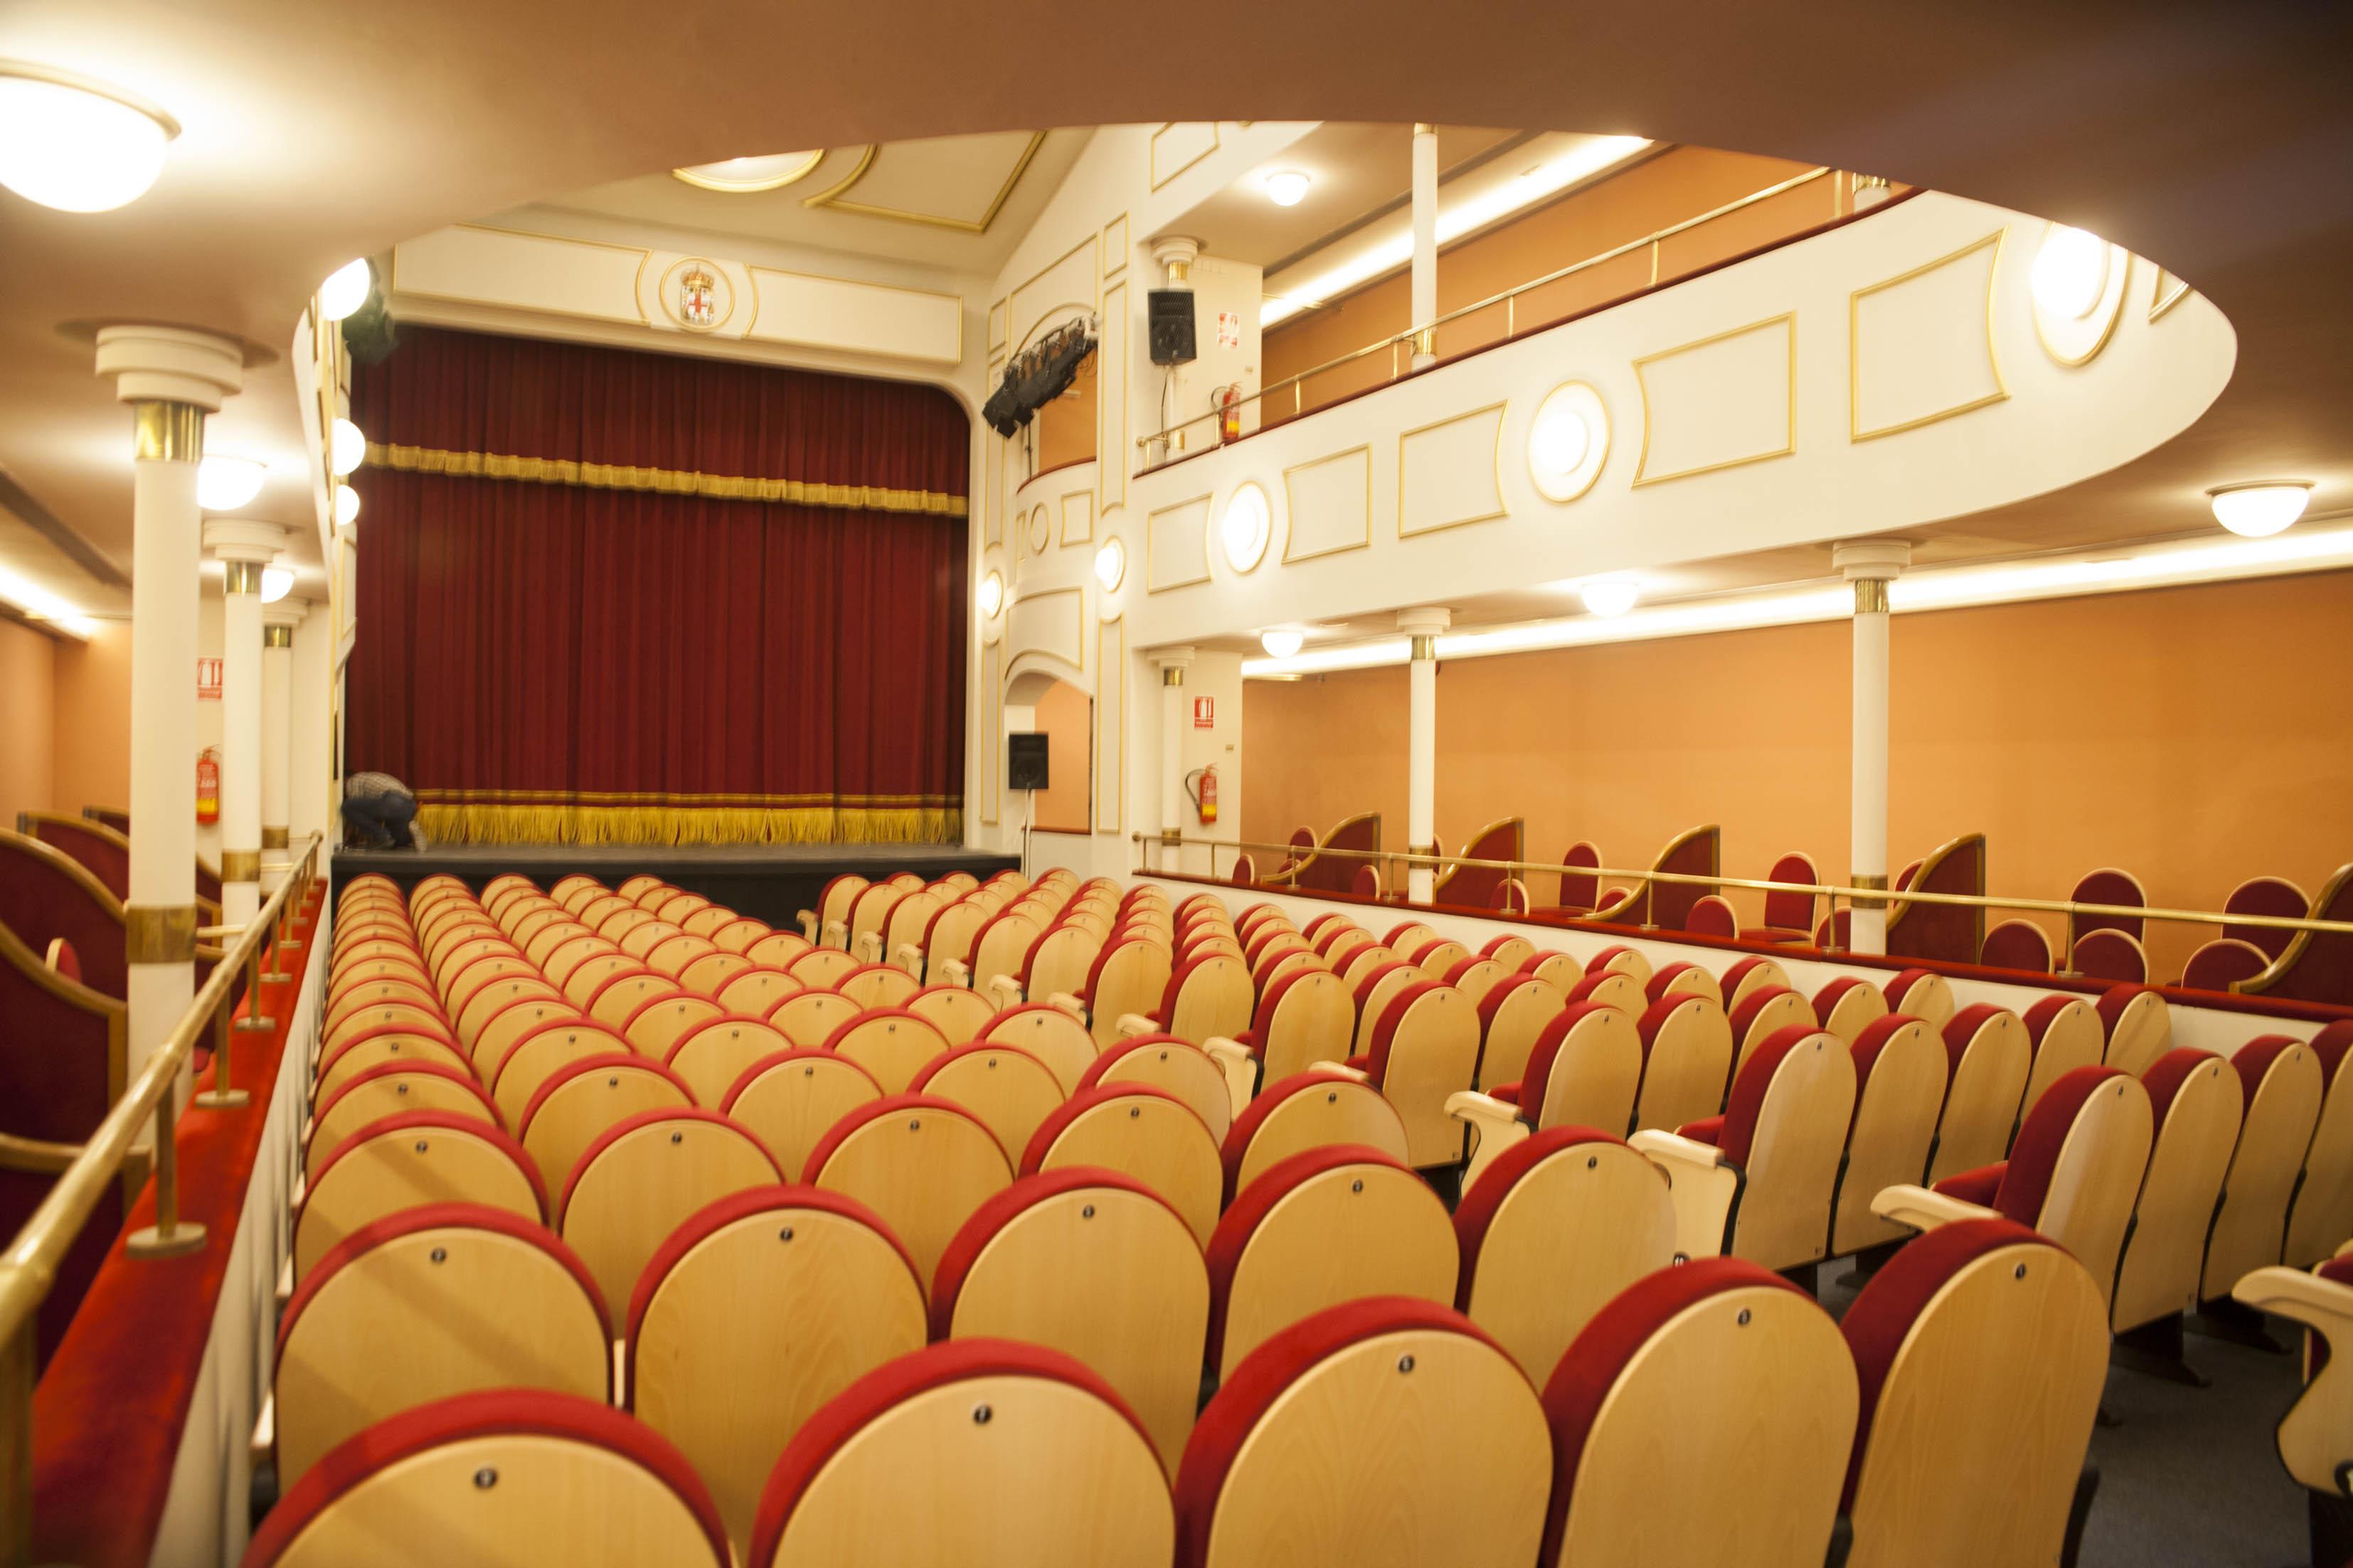 Escenario Teatro Apolo Almeria